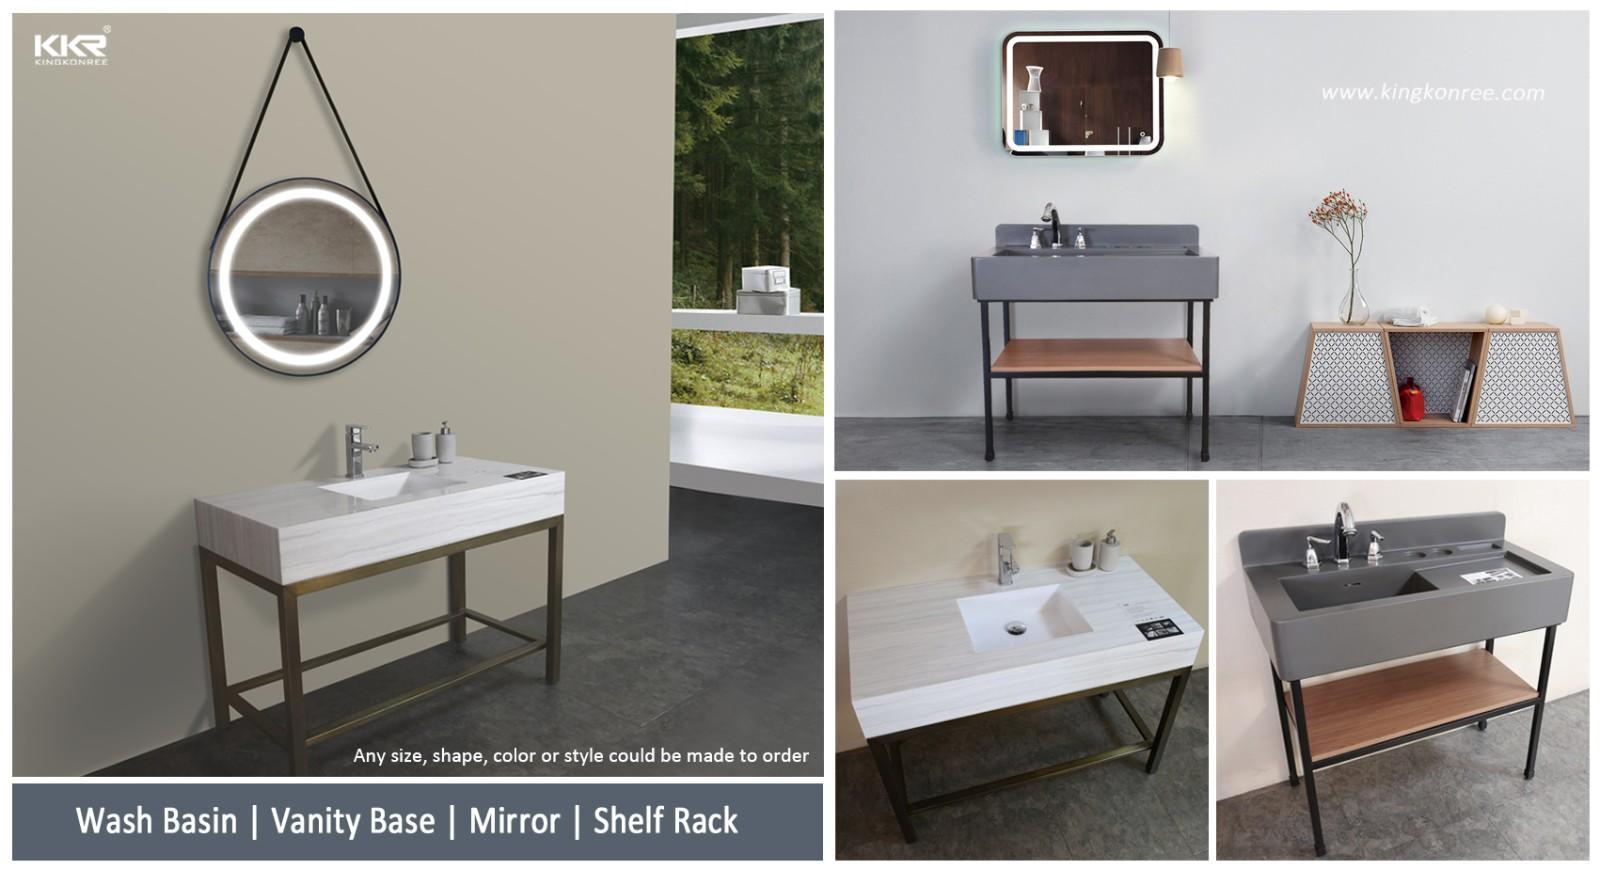 durable custom vanity tops customized for hotel